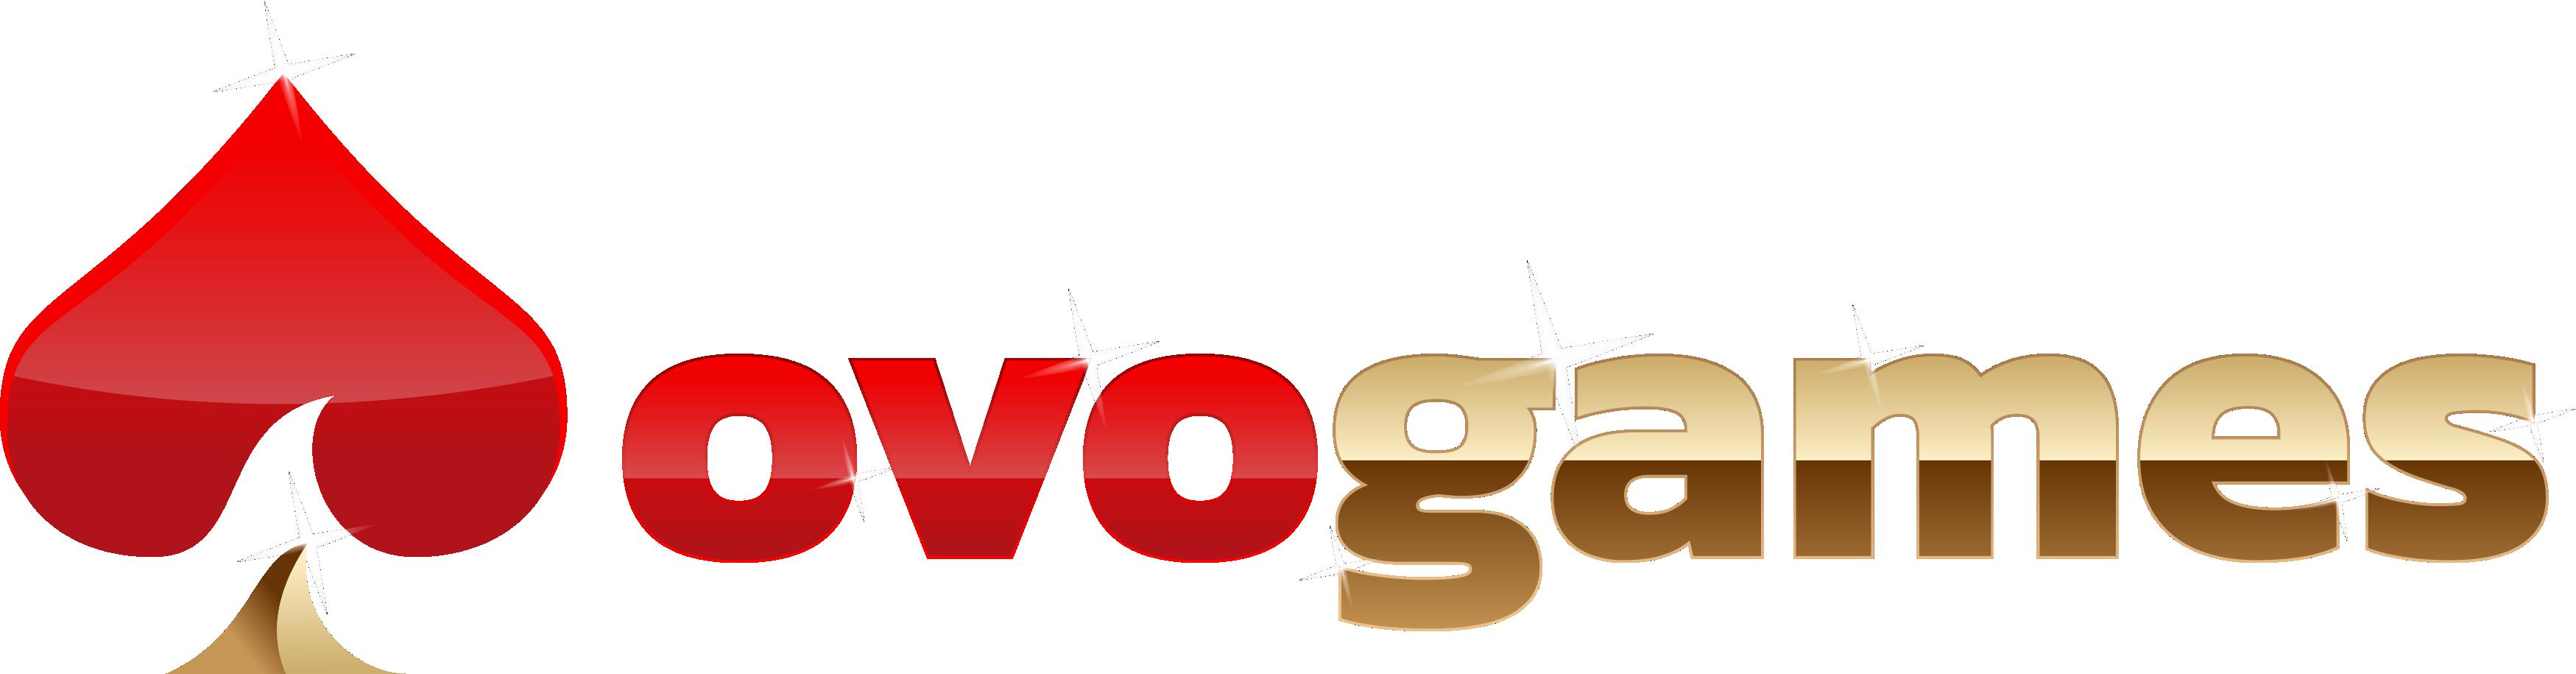 OVOGAMES: Daftar Slot Online Terpercaya